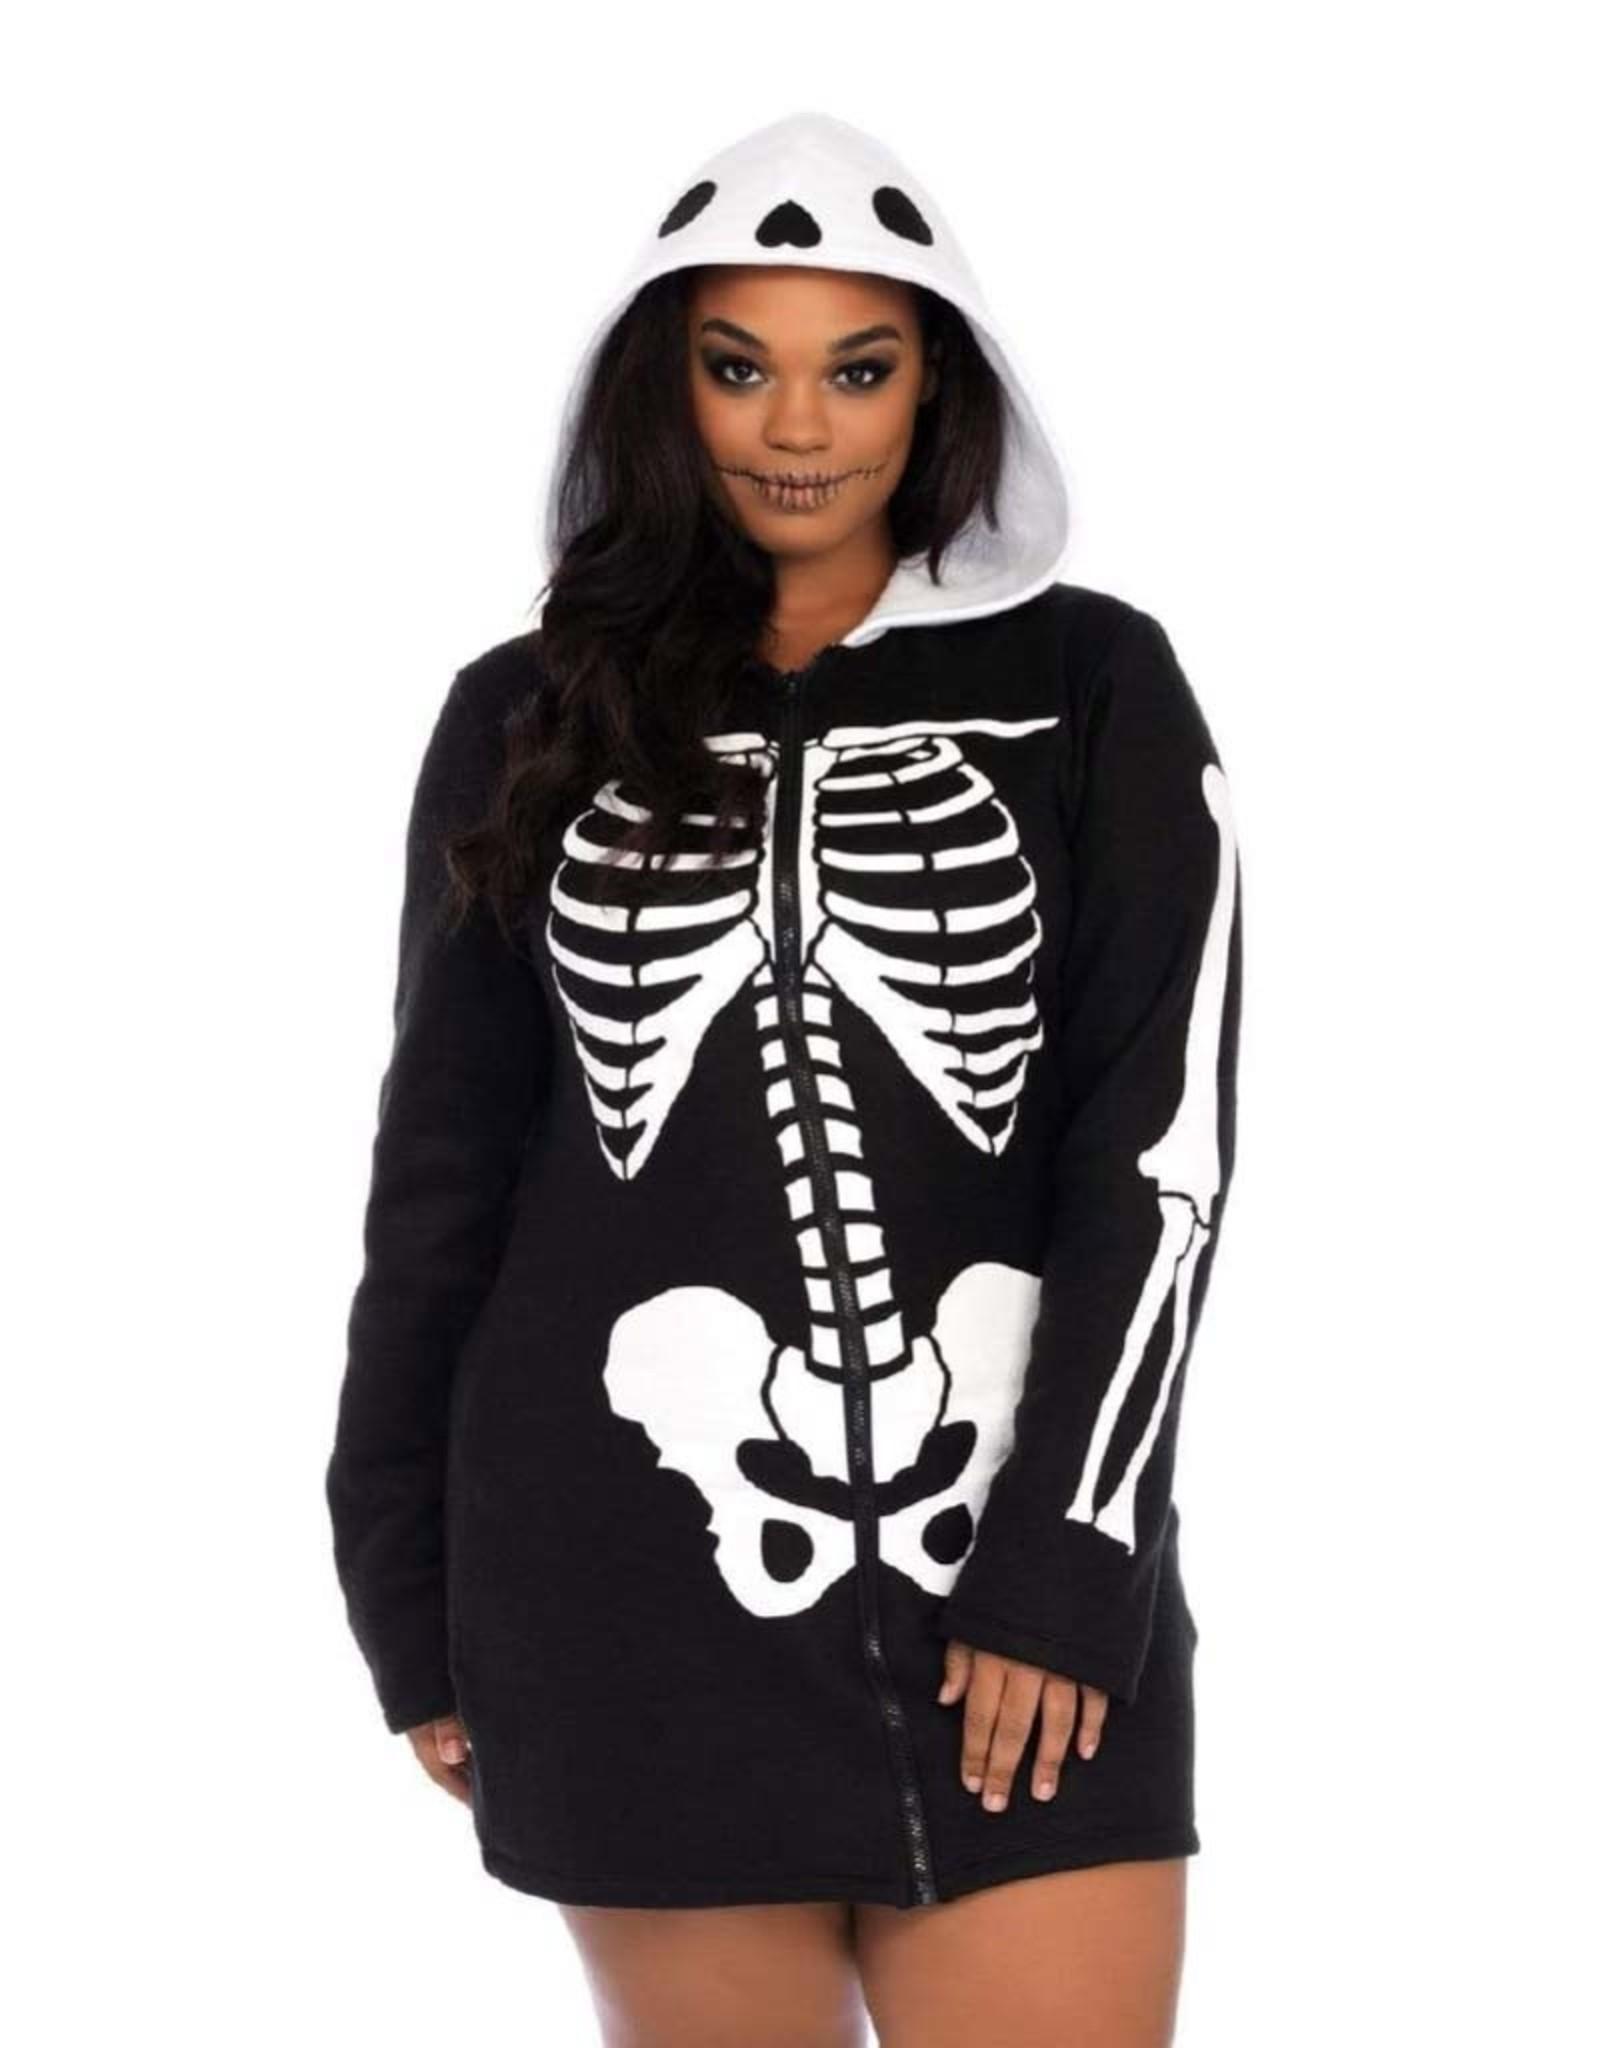 LEG AVENUE Cozy Skeleton - Women's